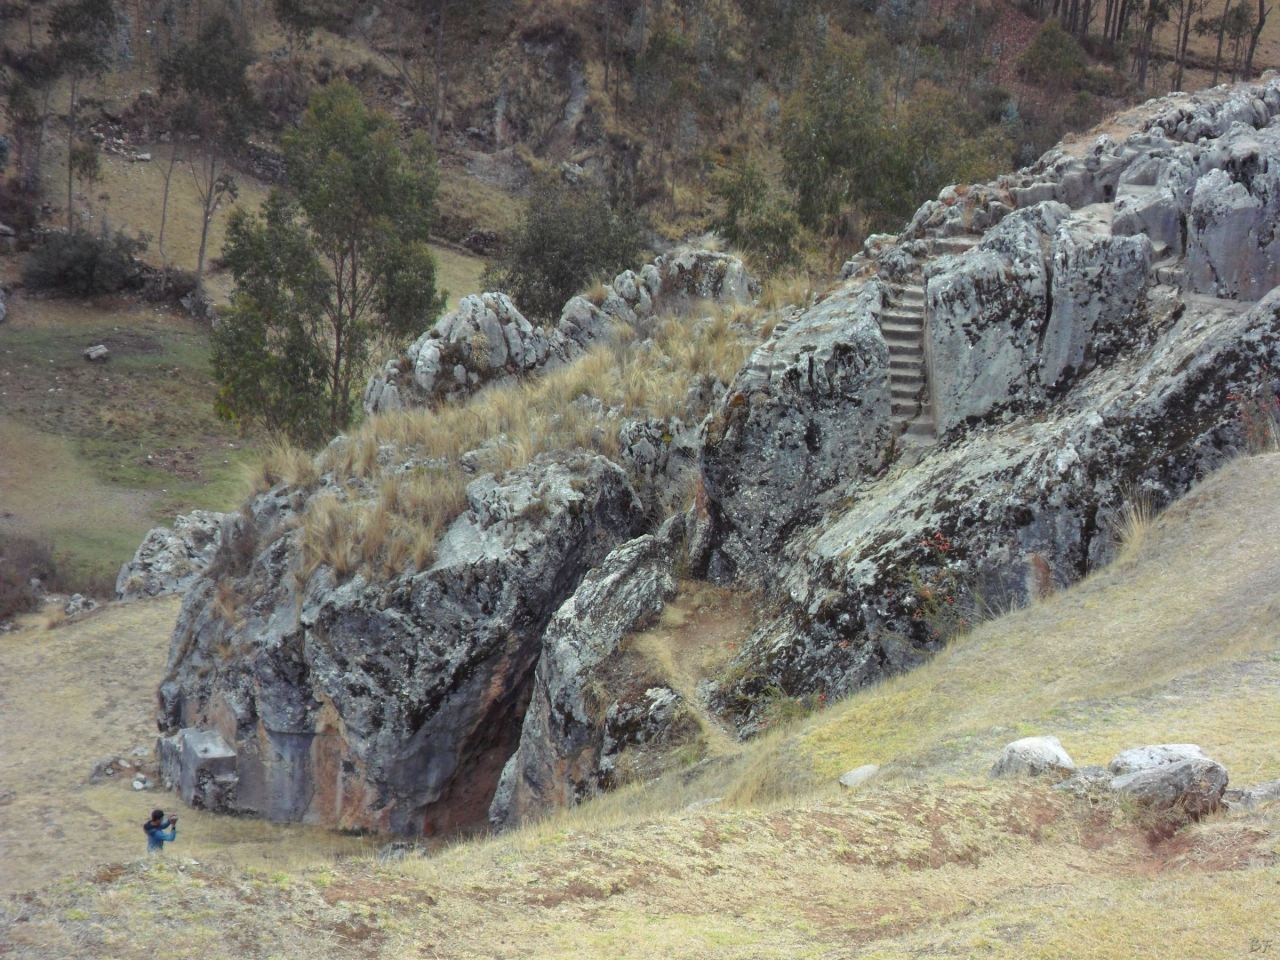 Chinchero-Mura-Poligonali-Piramide-Urubamba-Peru-4